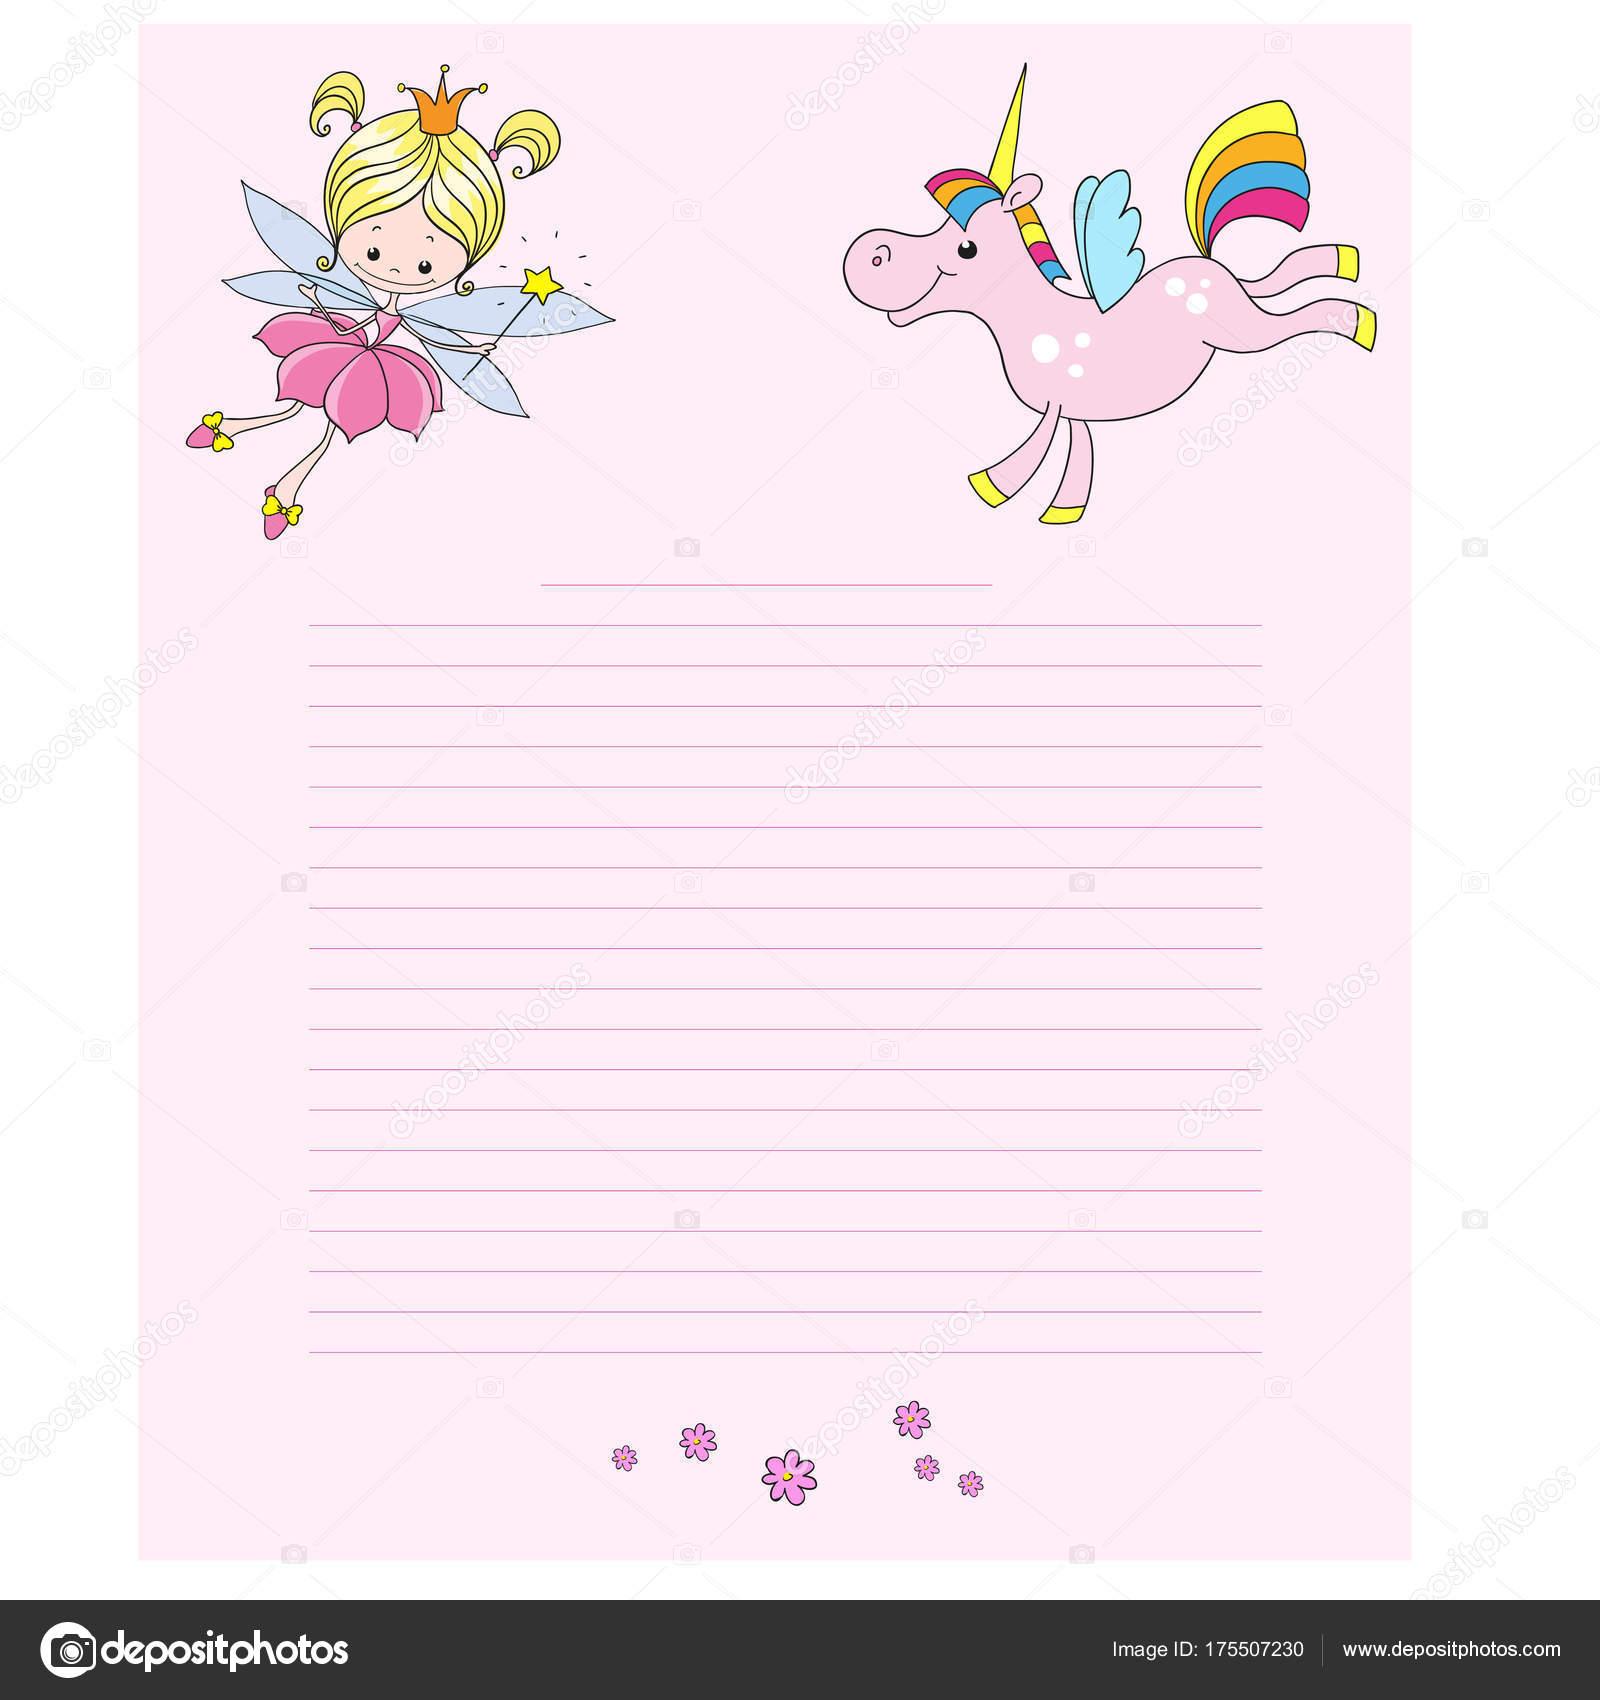 Fairy unicorn cartoon characters cute characters pink background fairy unicorn cartoon characters cute characters pink background greeting card stock vector kristyandbryce Gallery